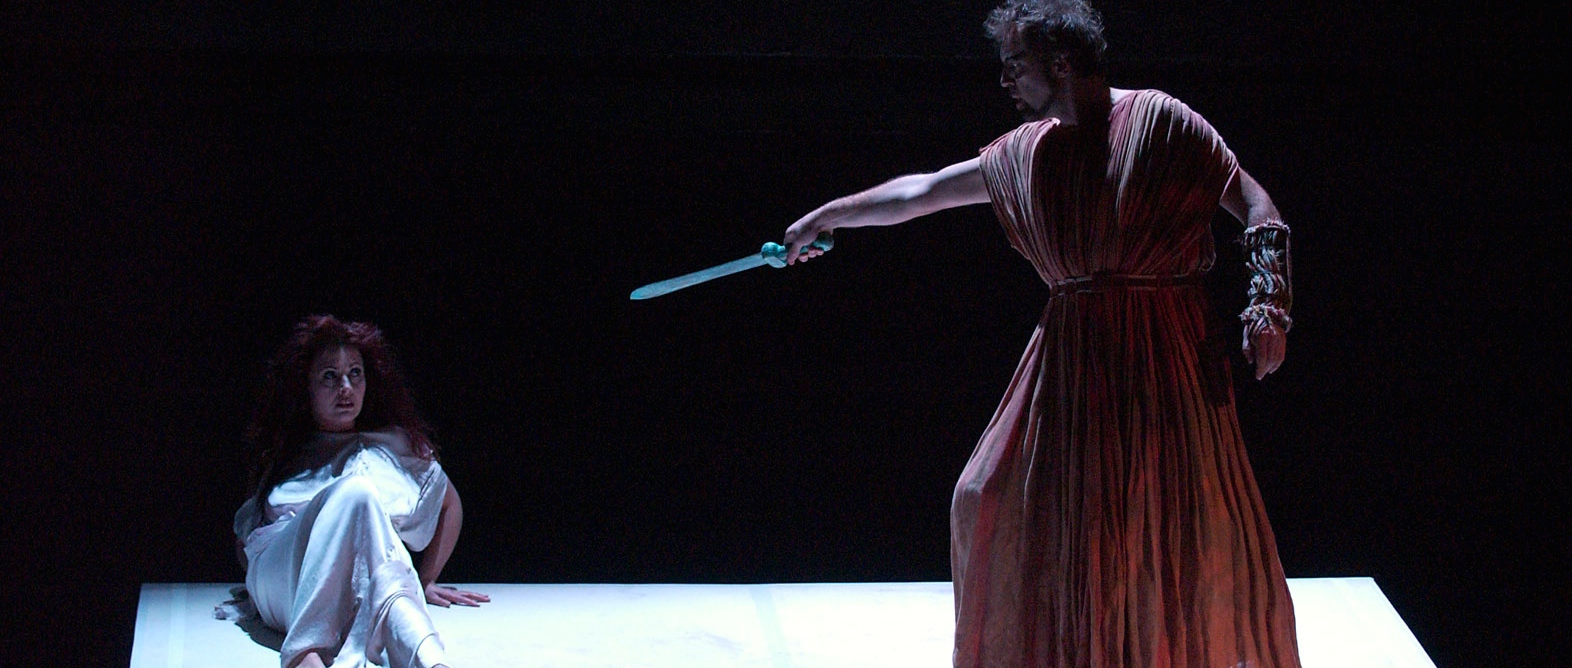 The Rape of Lucretia - 2004